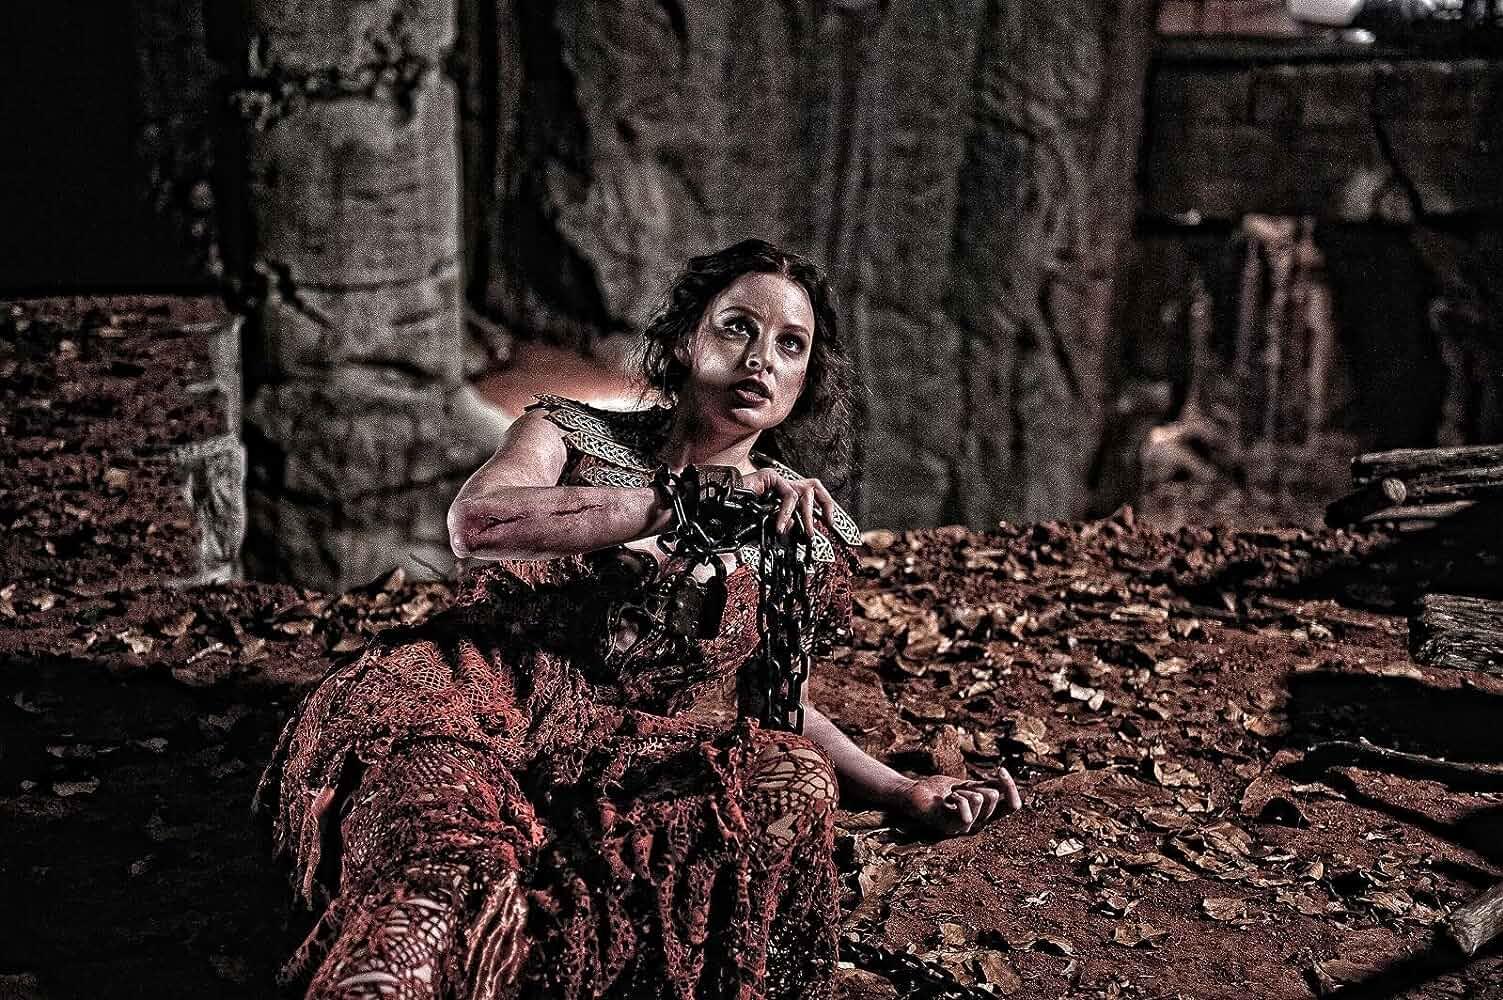 Rachel Nichols in Conan the Barbarian (2011)